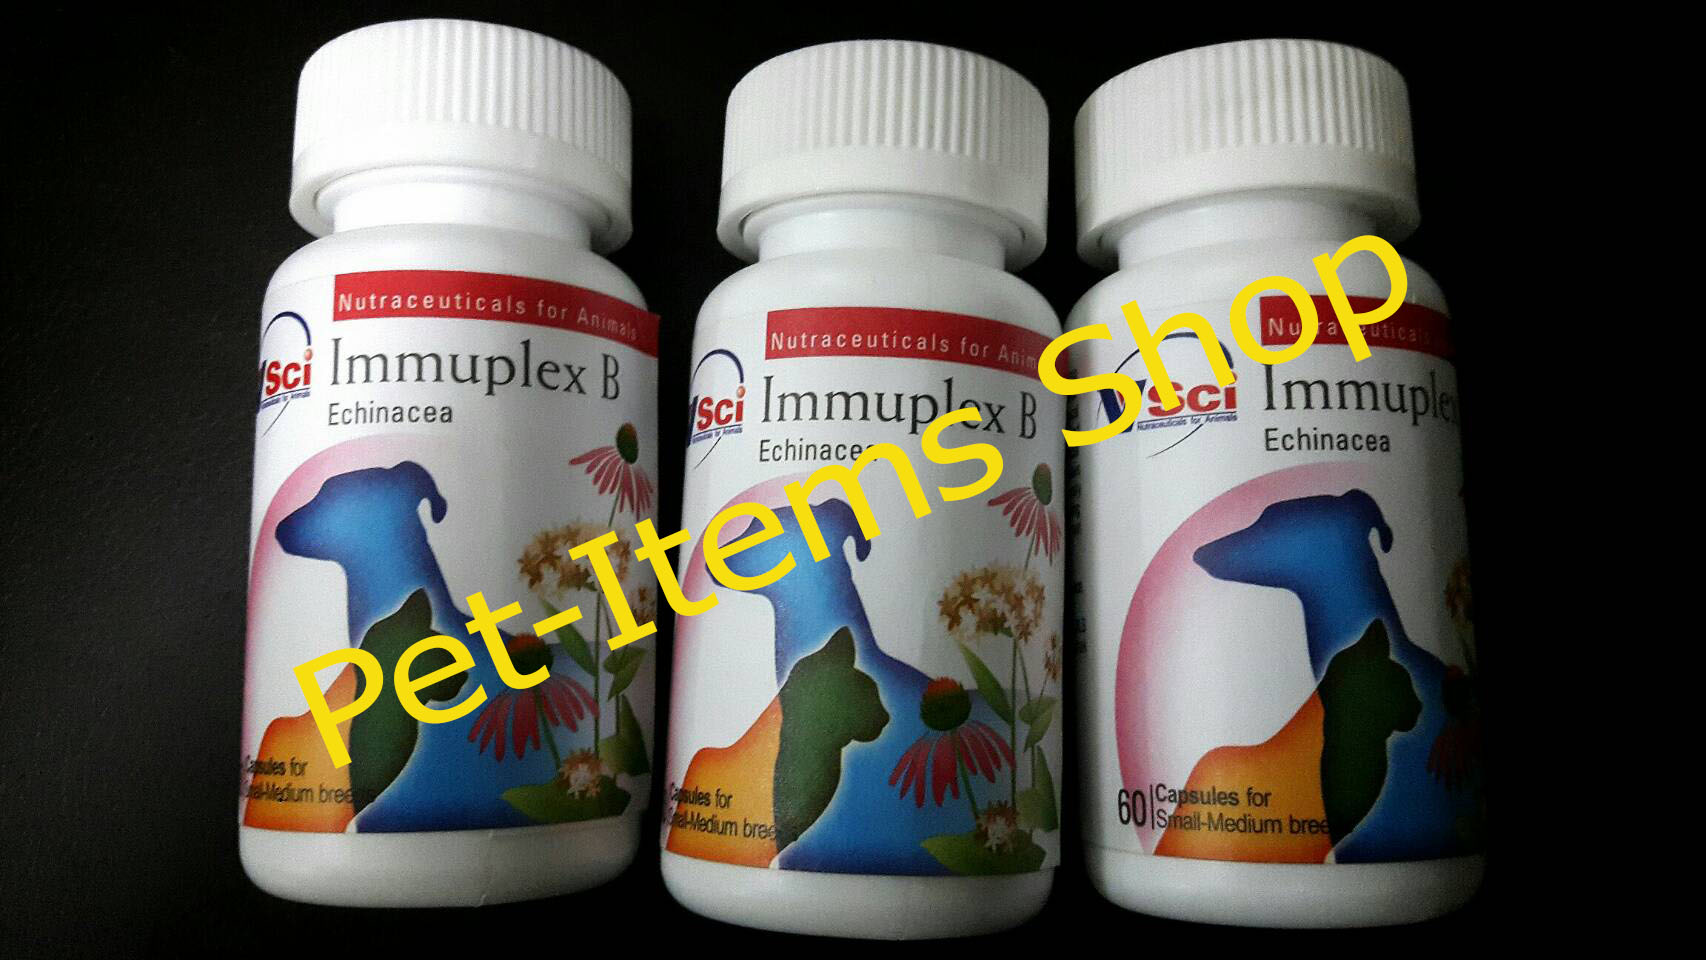 Immuplex B